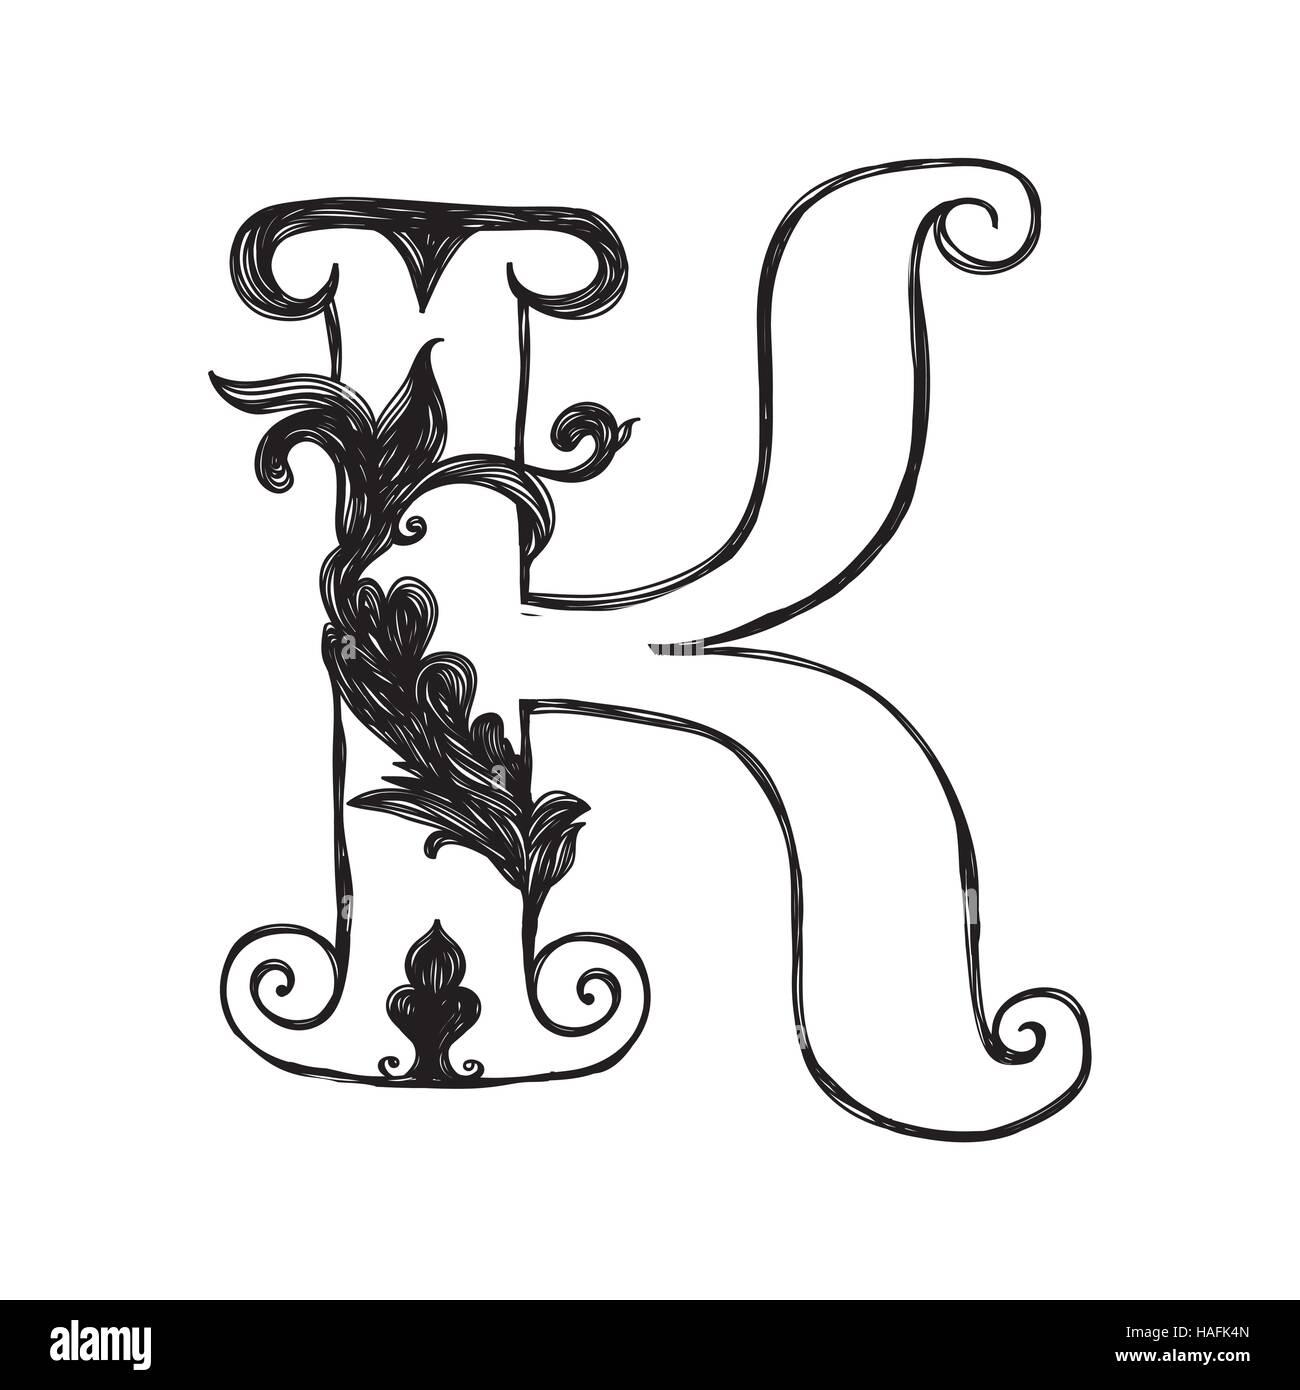 The Vintage Style Letter K Stock Vector Art Illustration Vector